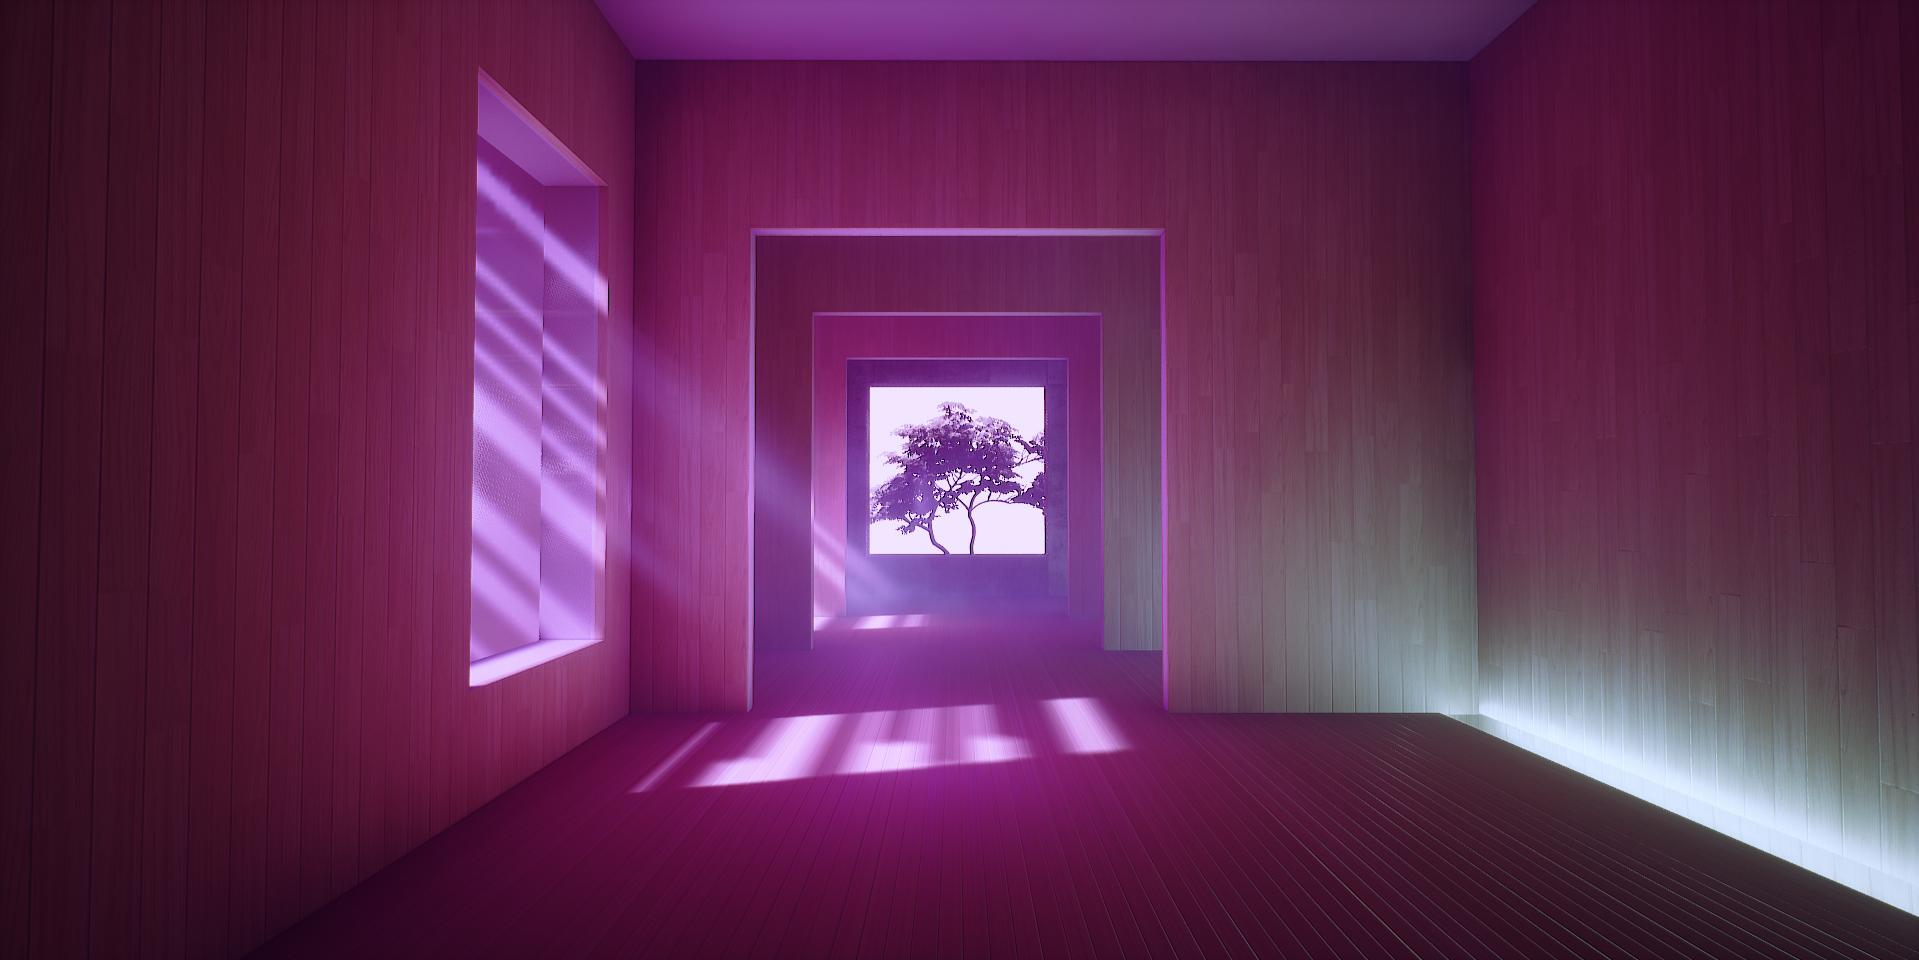 Ue4 Relighting Blade Runner 2049 Style Lighting Polycount